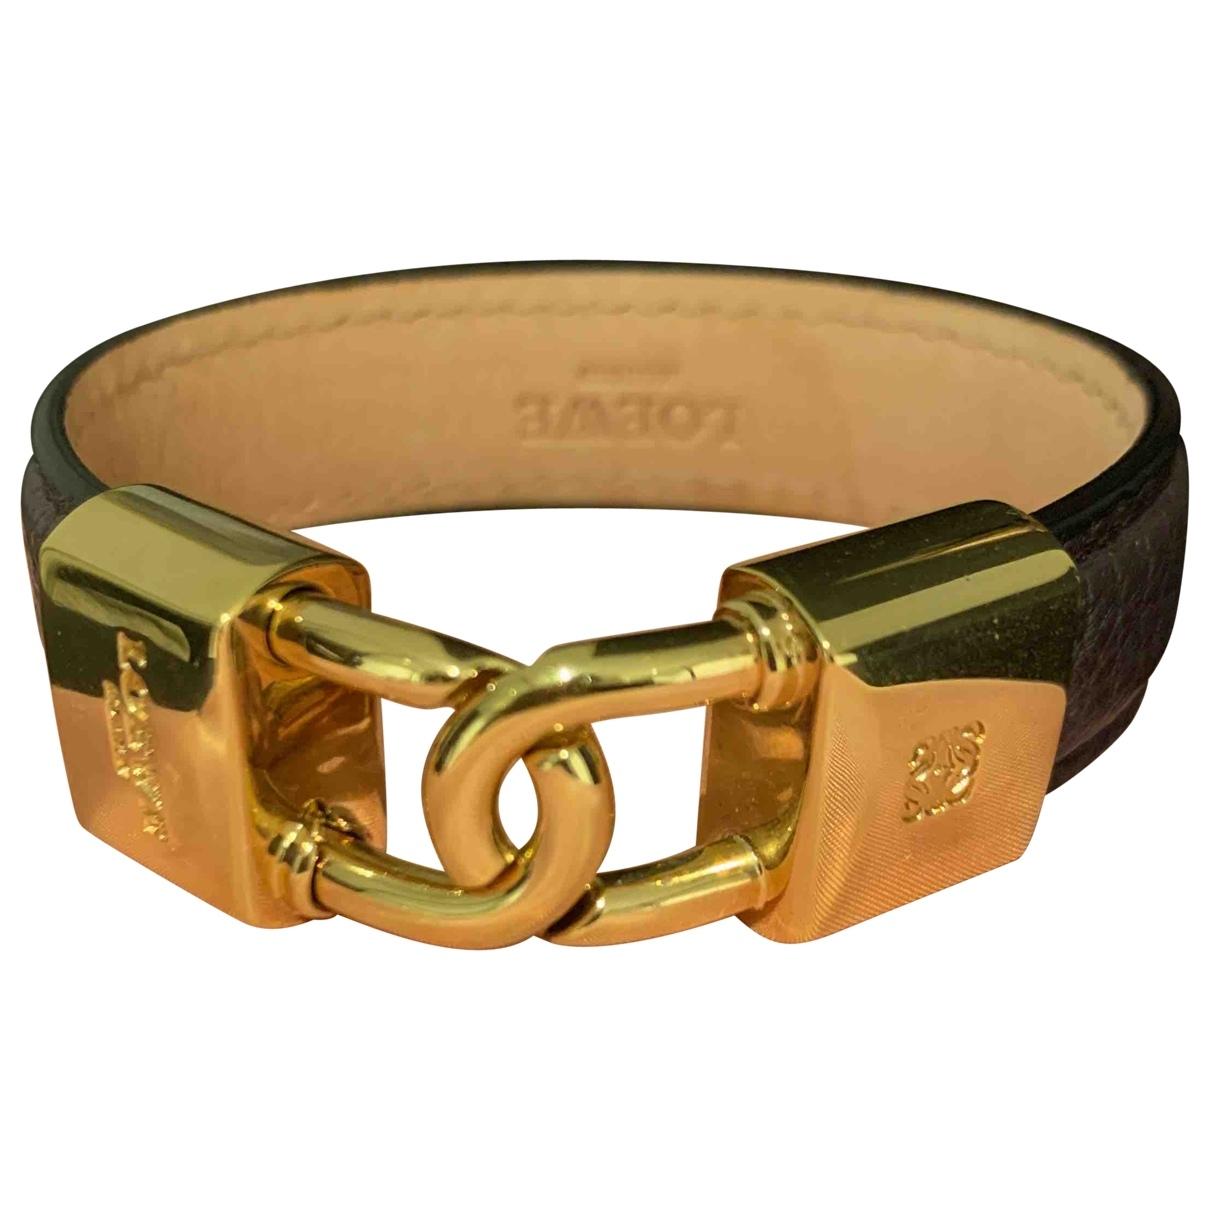 Loewe - Bracelet   pour femme en cuir - marron